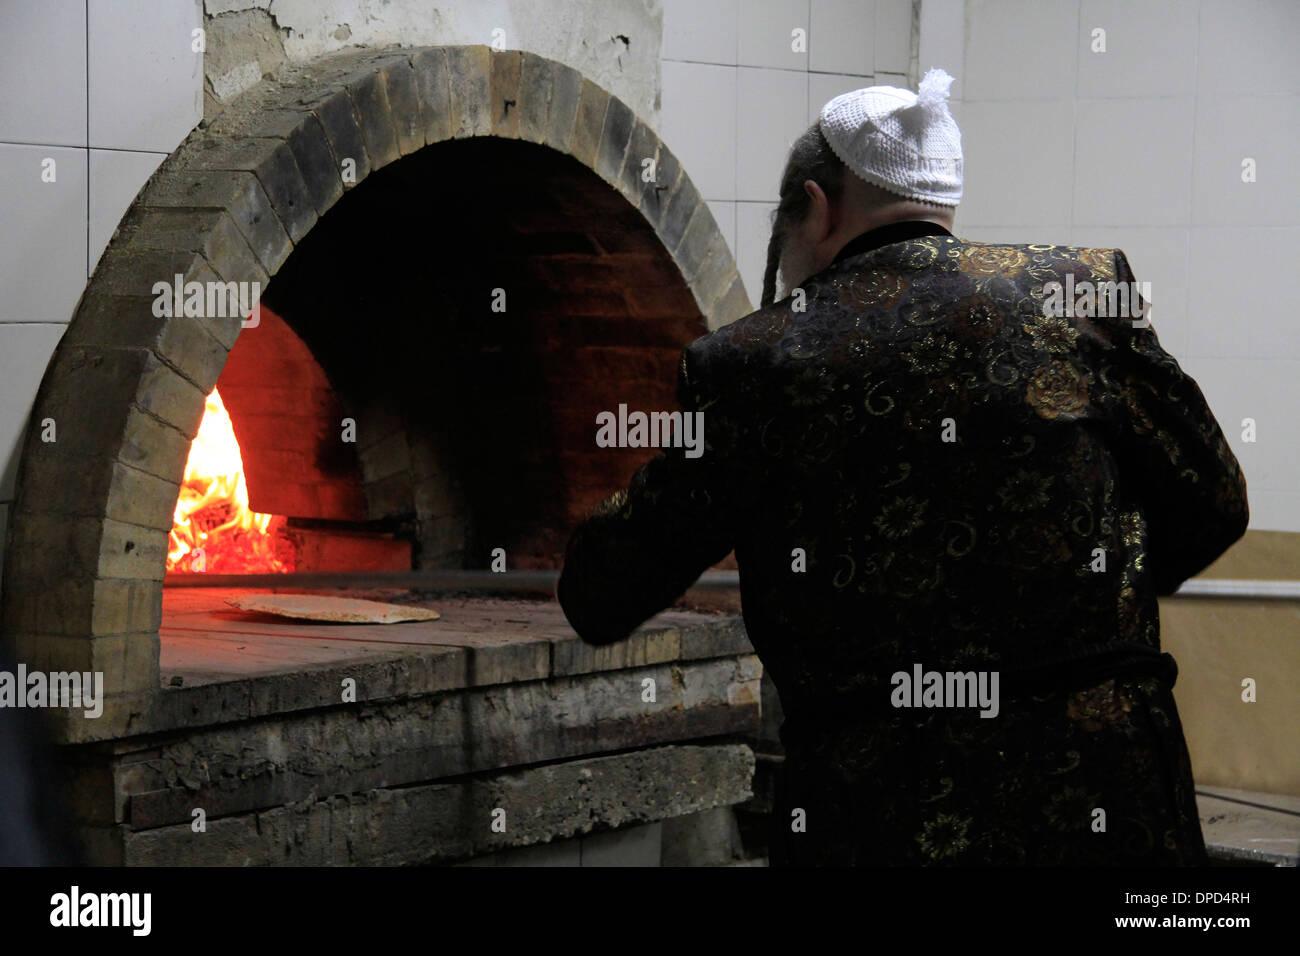 Matzah baking ahead of the Seder meal at the Hasidic Premishlan congrgation - Stock Image